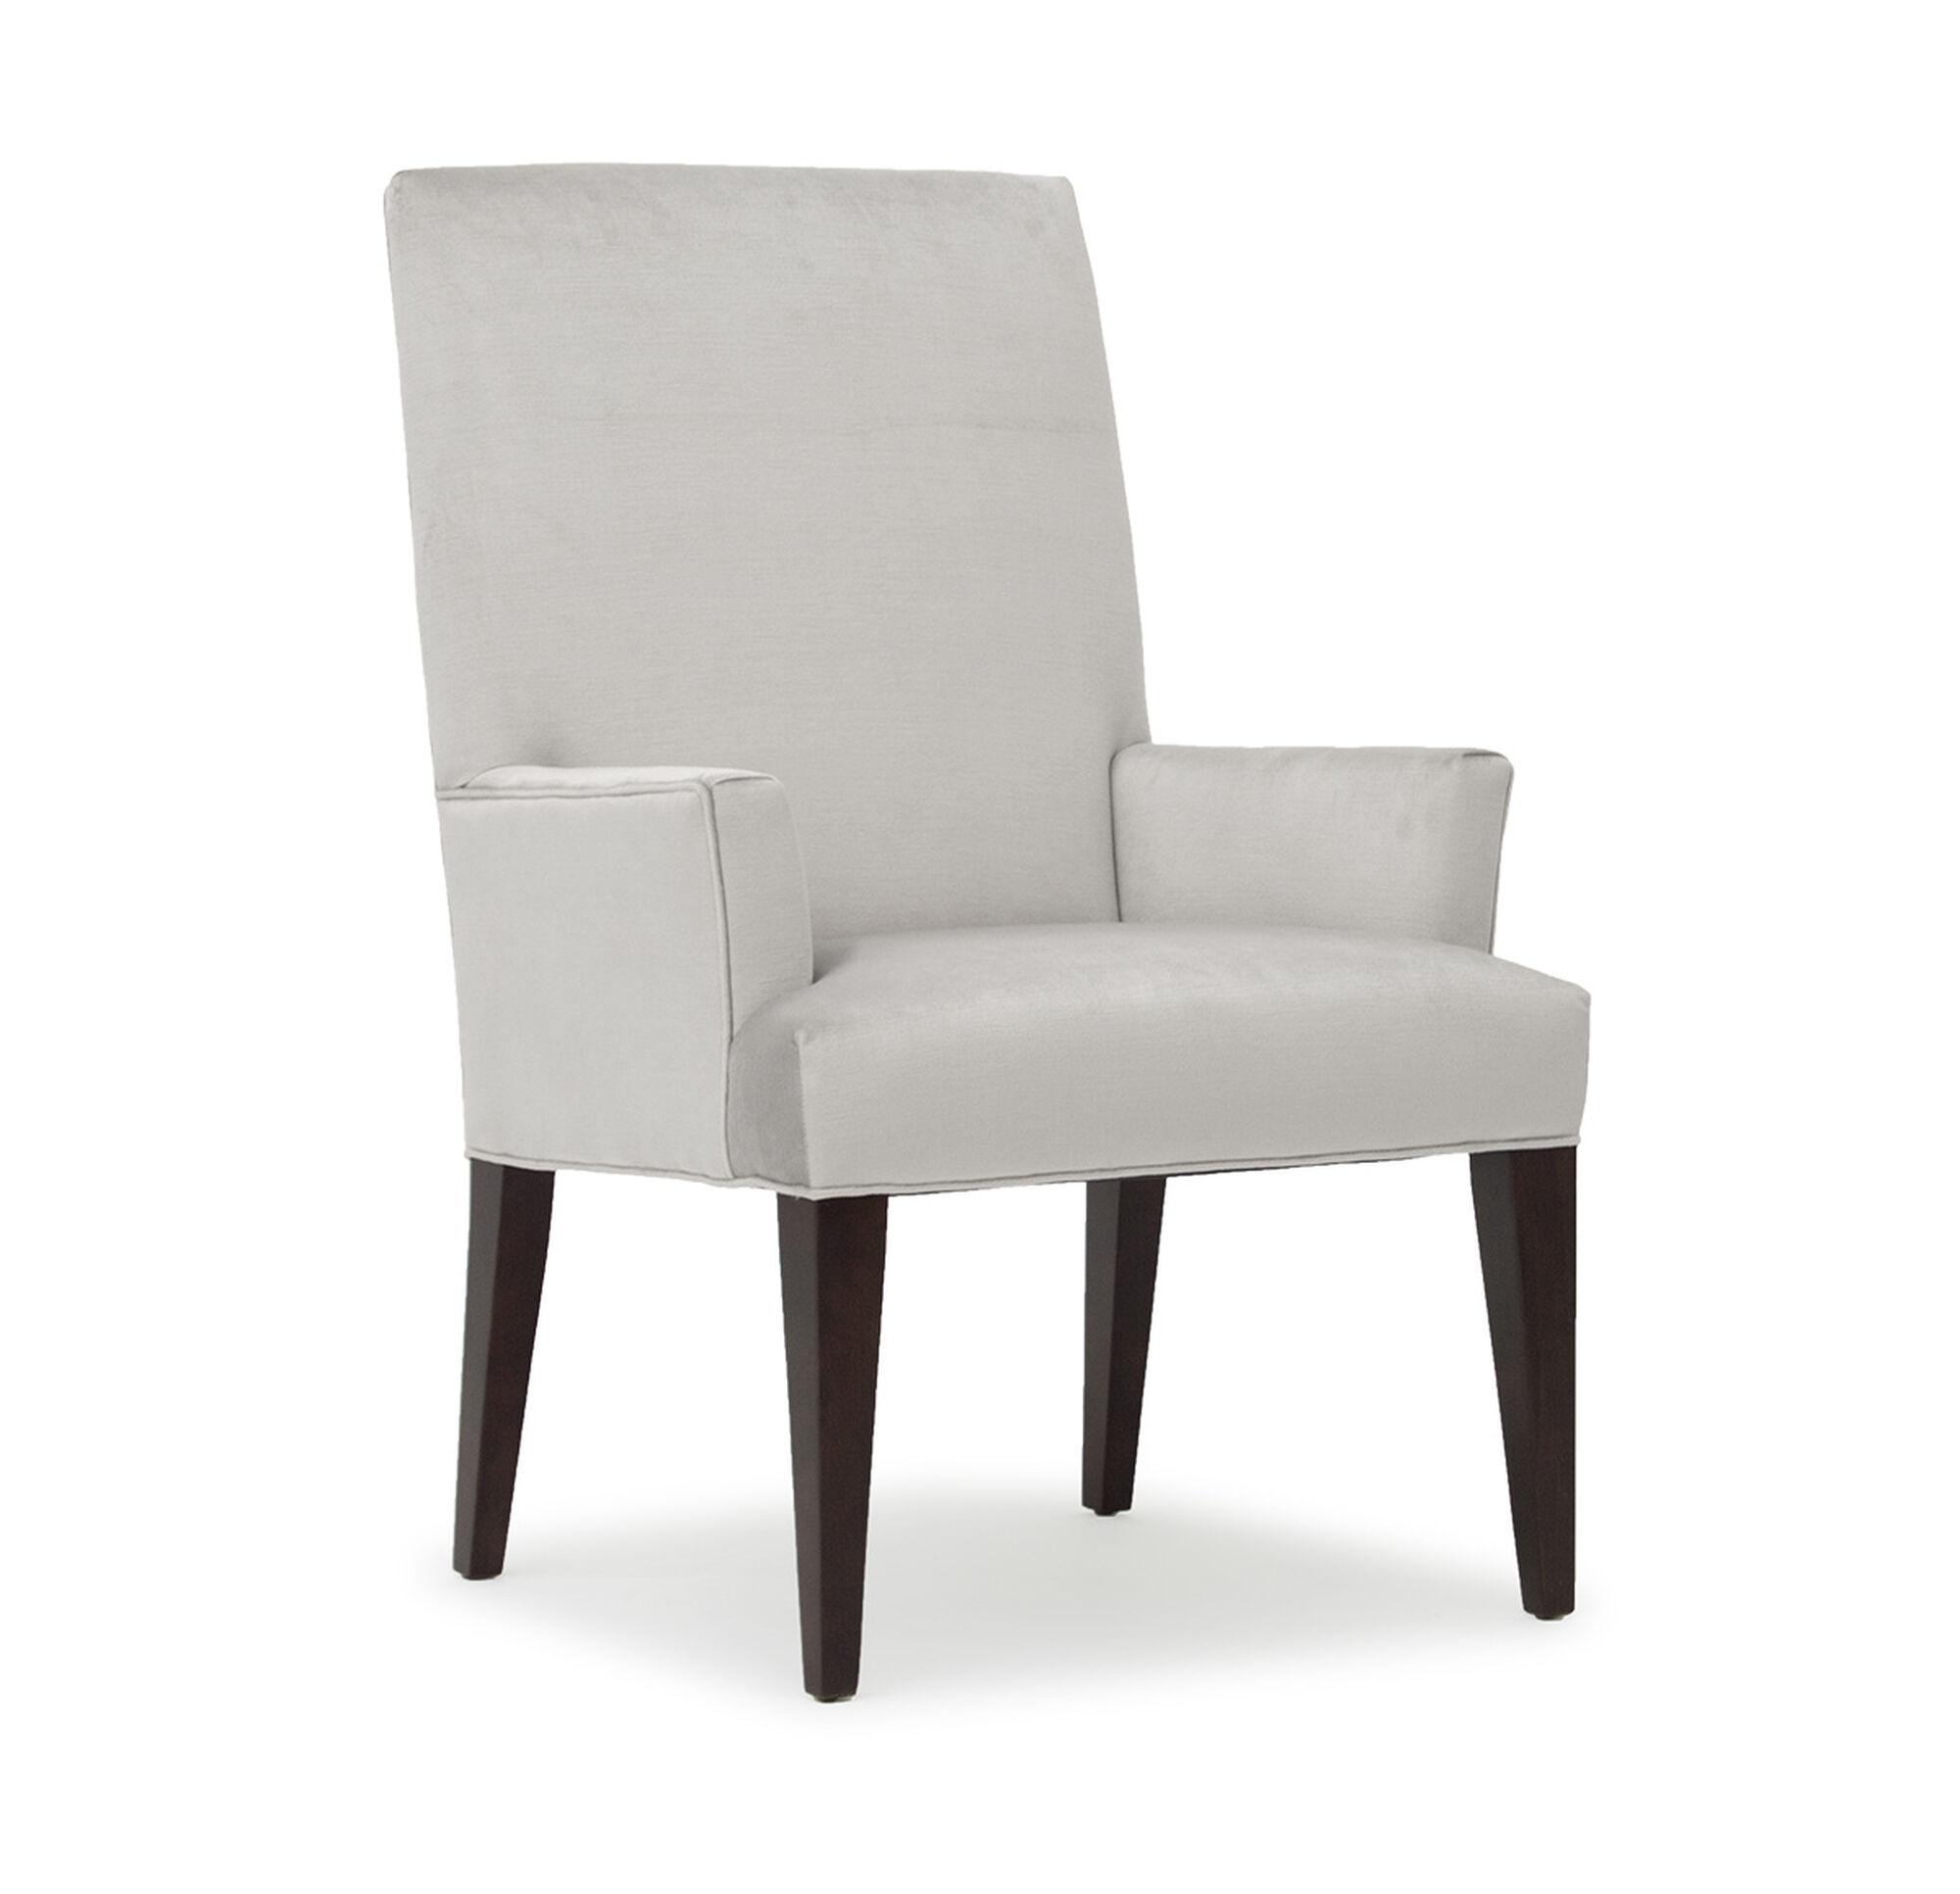 Turn Dininf Room Chair Into Armchair